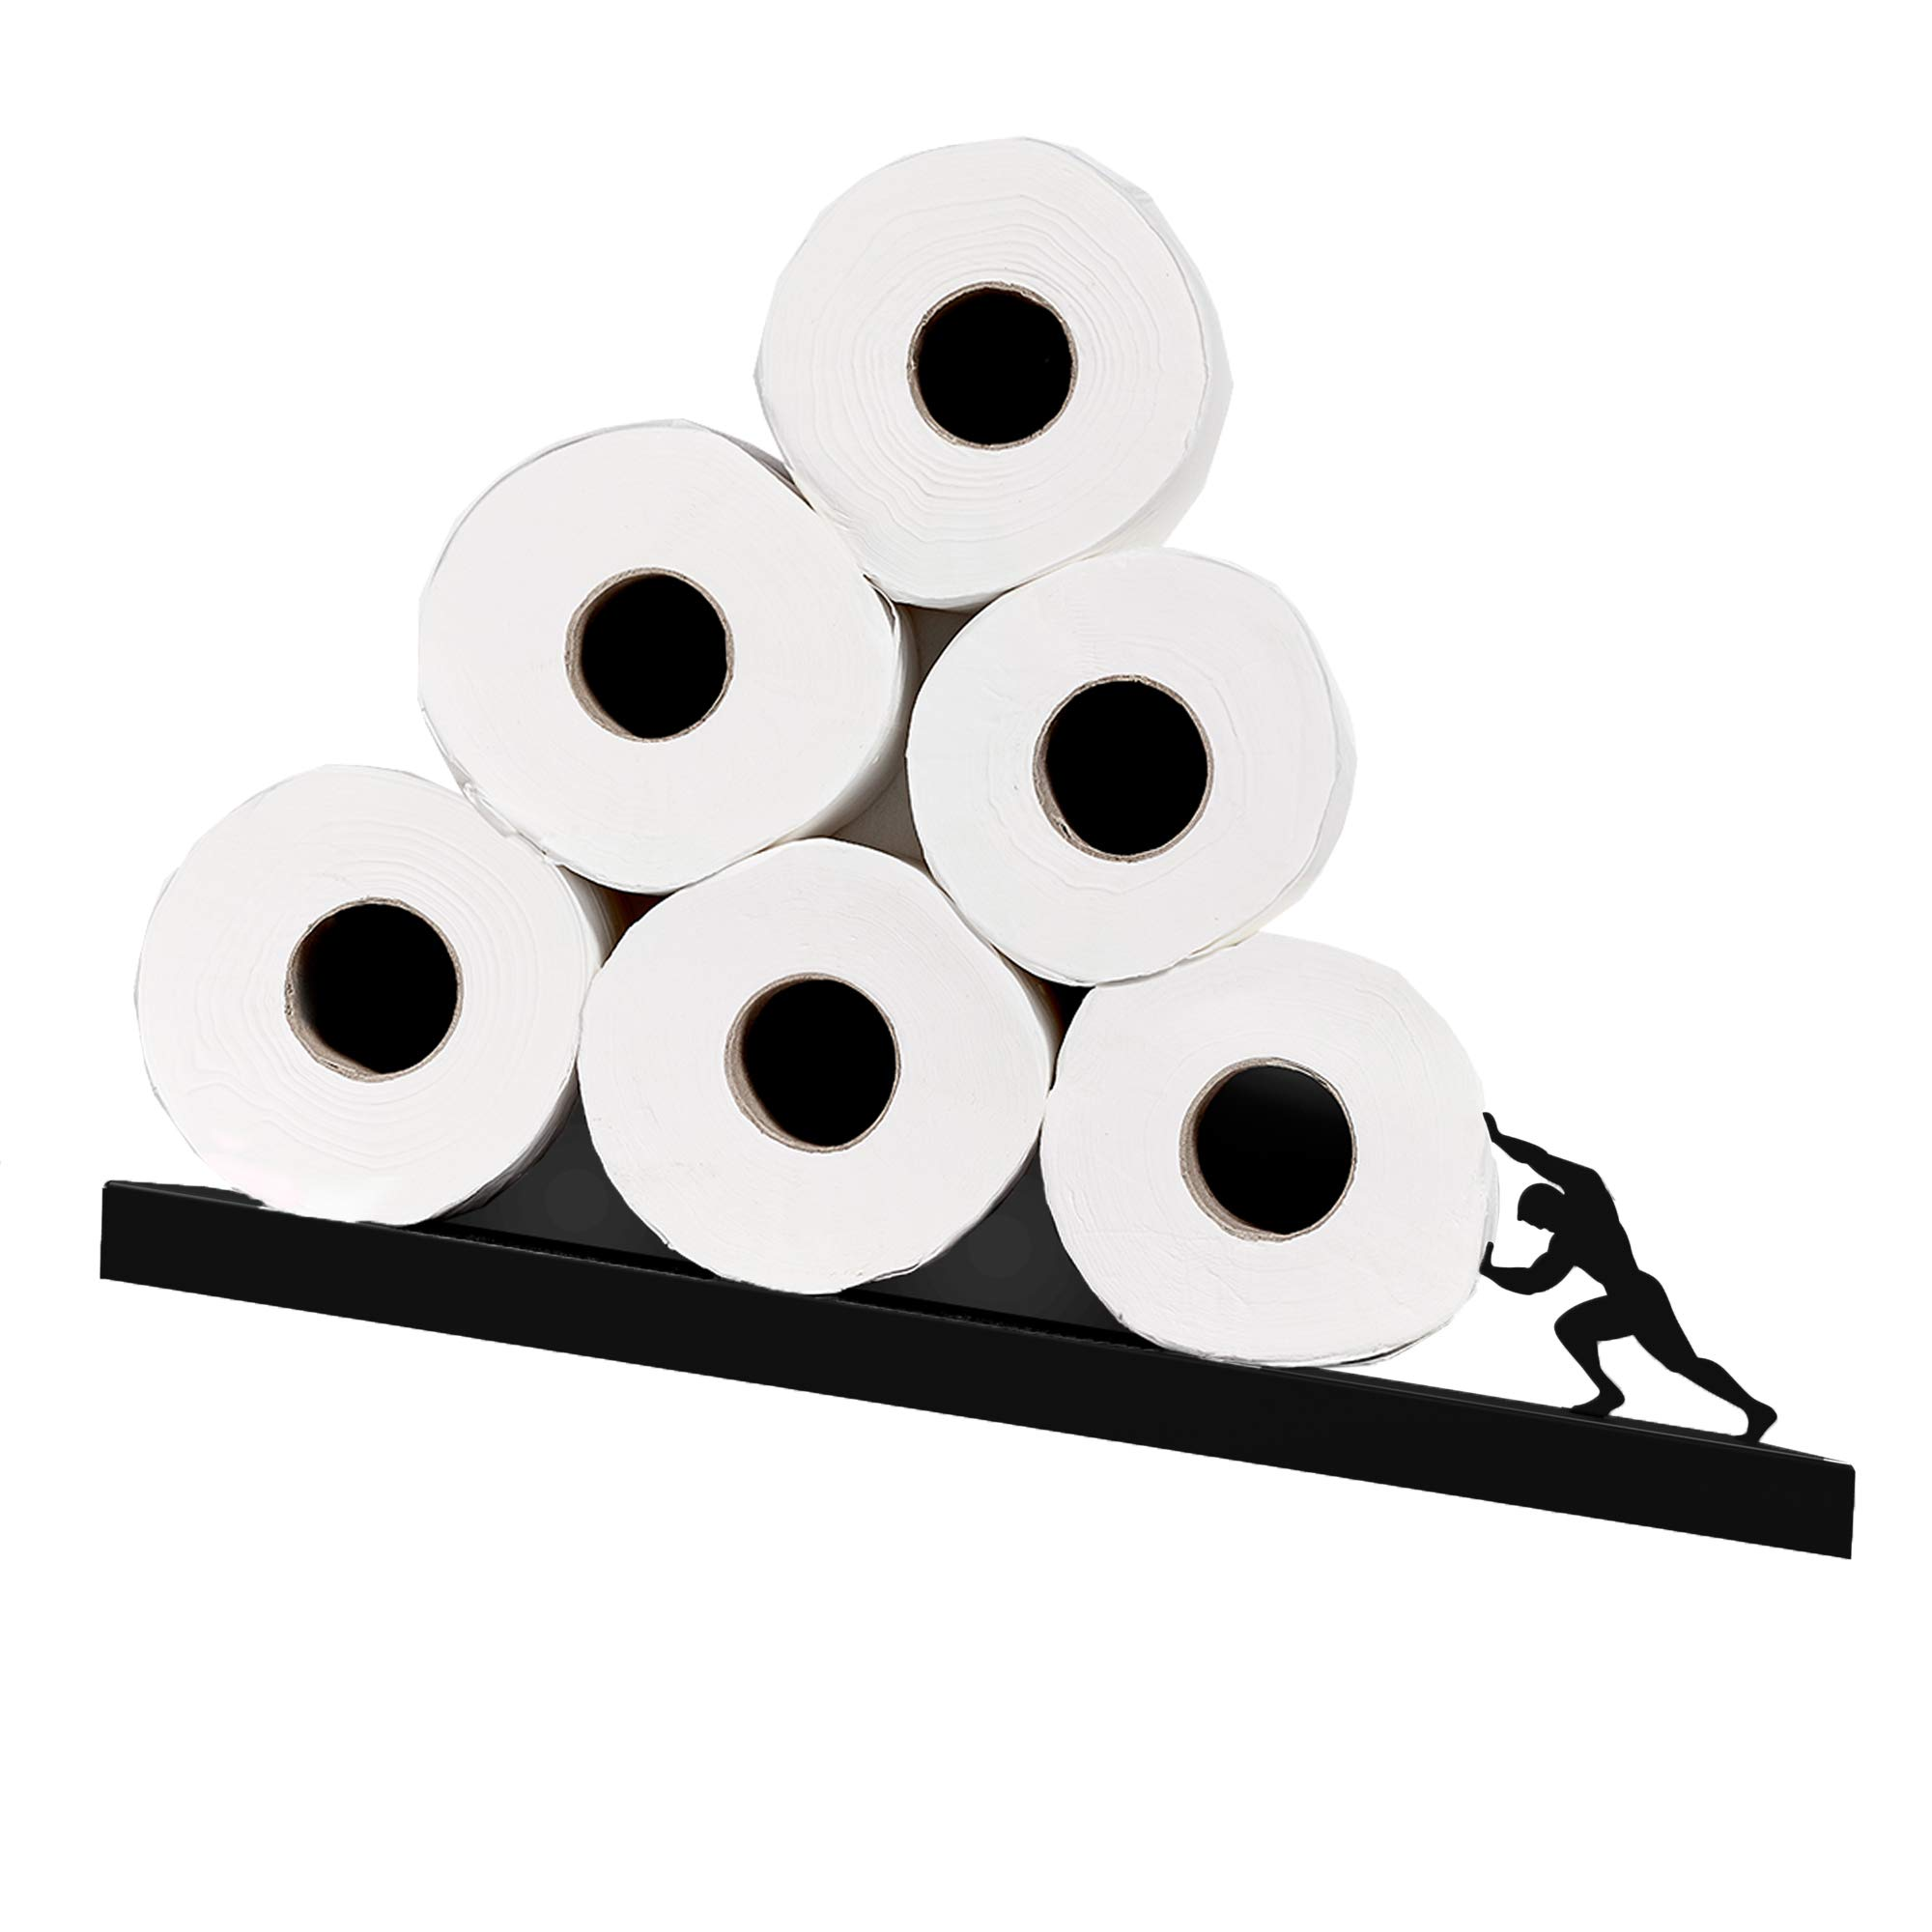 Toilet Paper Holder - Sisyphus Shelf for Toilet Paper Rolls - Bath Decor - Tilted Toilet Paper Rack - Bathroom Accessories - Black Toilet Paper Storage - Unique Tissue Paper Rolls Storage